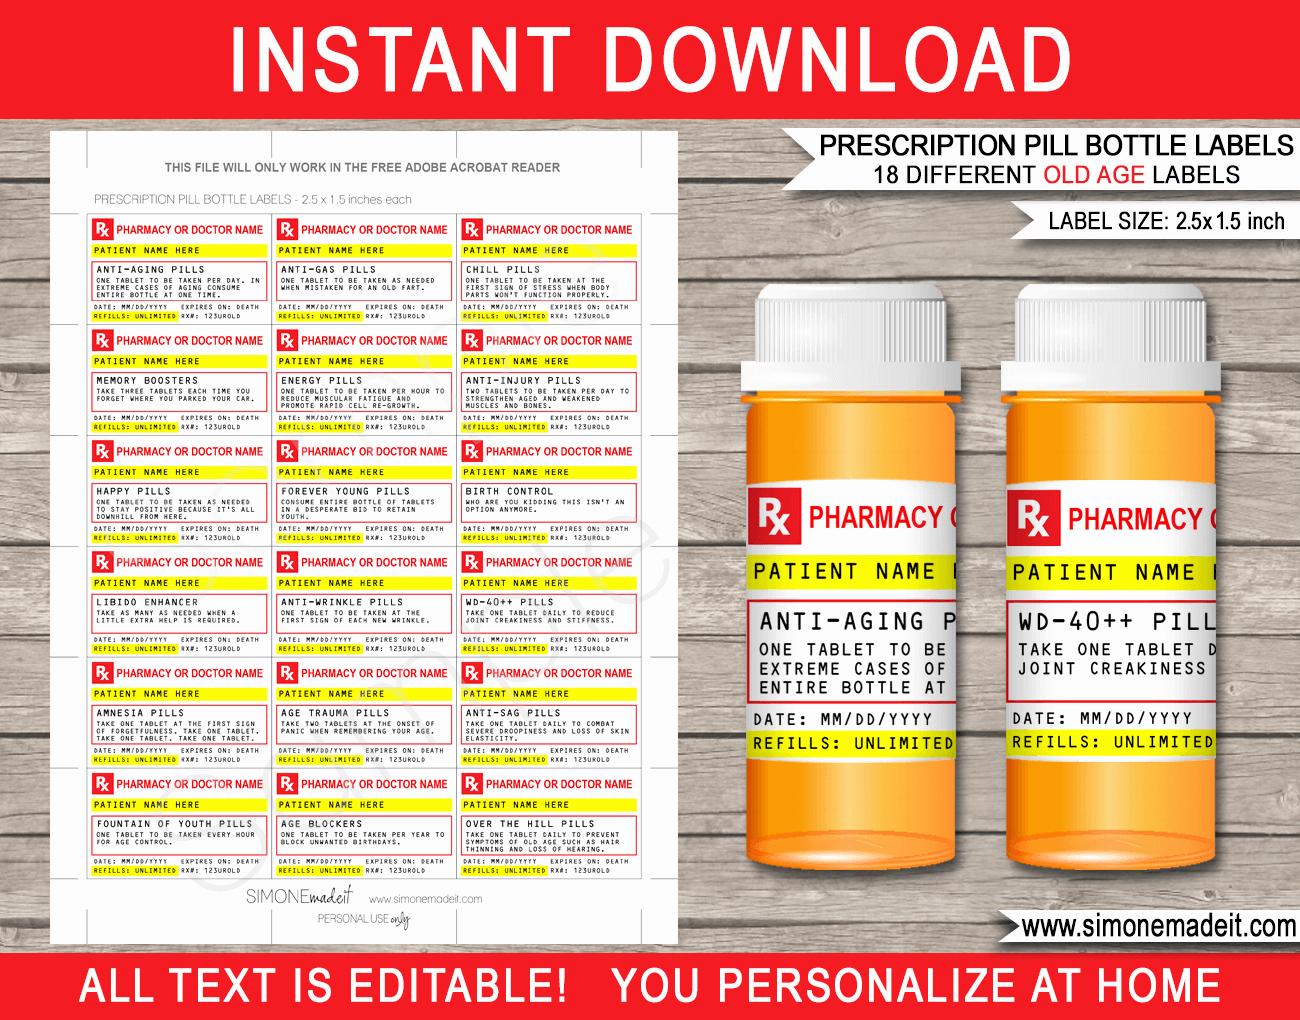 Fake Prescription Label Template Beautiful Old Age Prescription Pill Bottle Labels Gag Gift